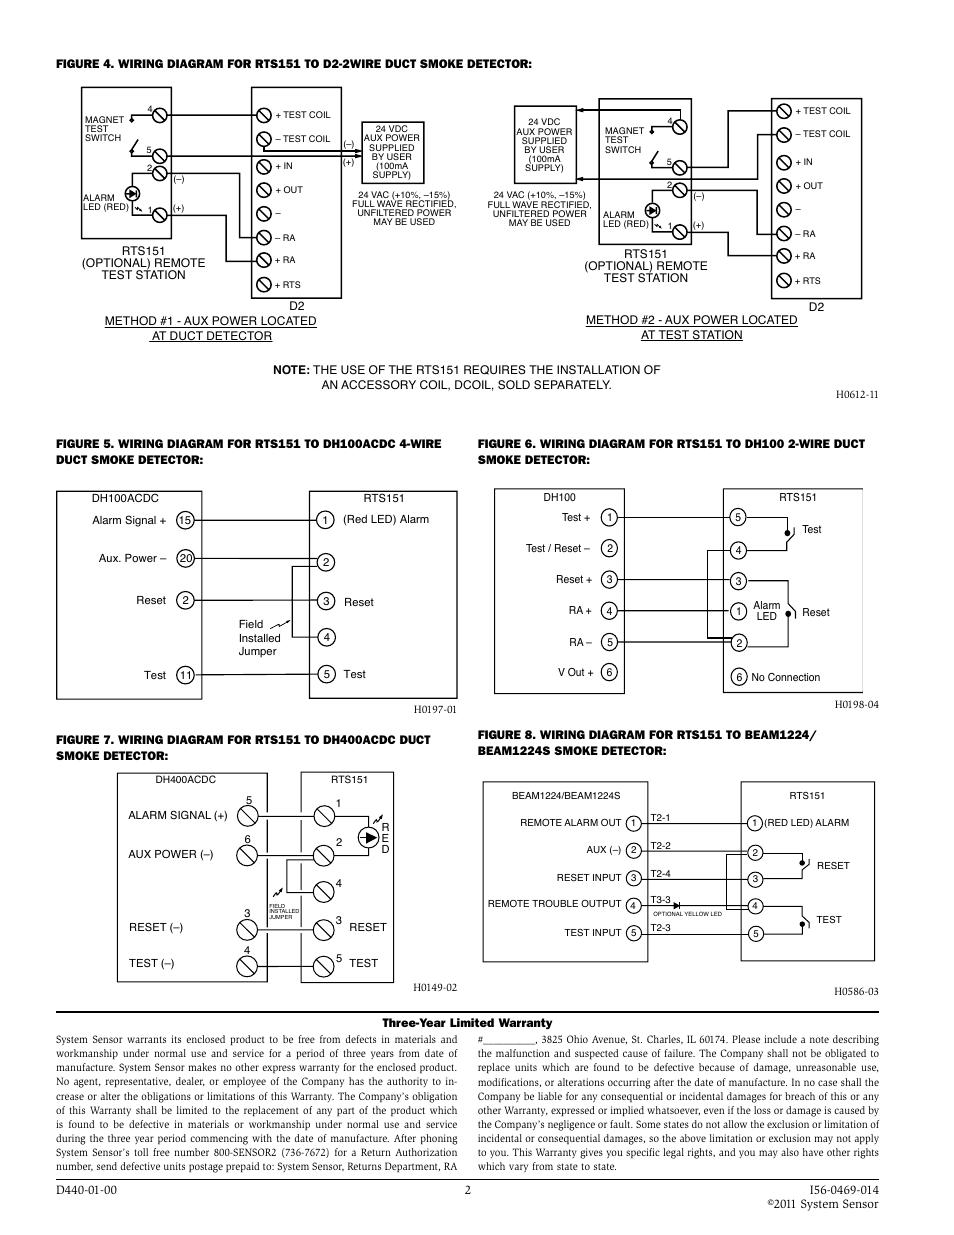 system sensor rts151 page2?resize=665%2C861 glamorous system sensor rts151 wiring diagram pictures wiring hkc sensor wiring diagram at fashall.co